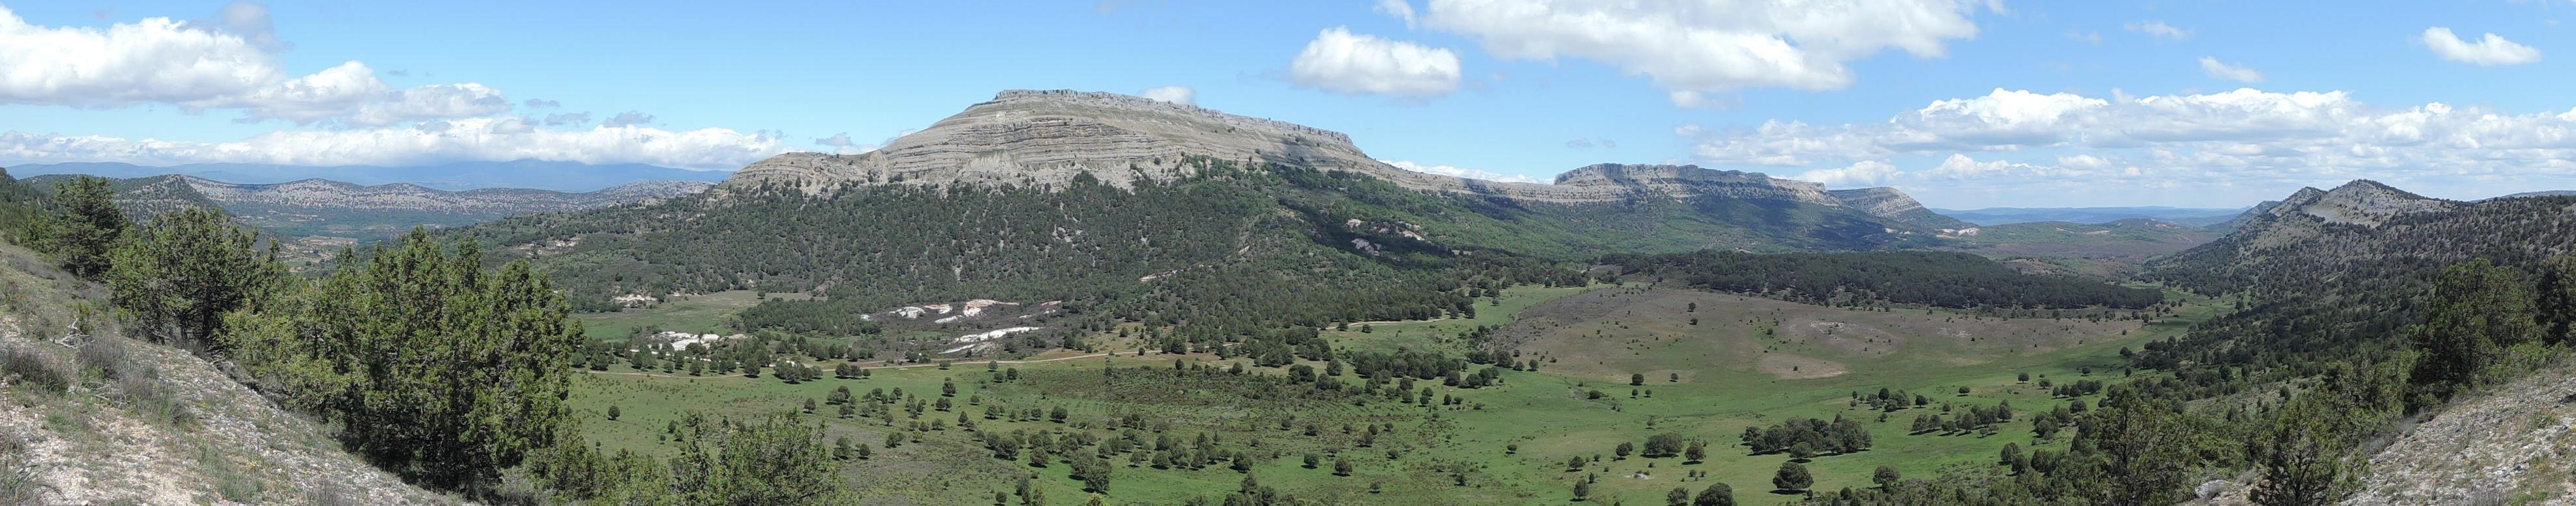 Valle de Mirandilla.